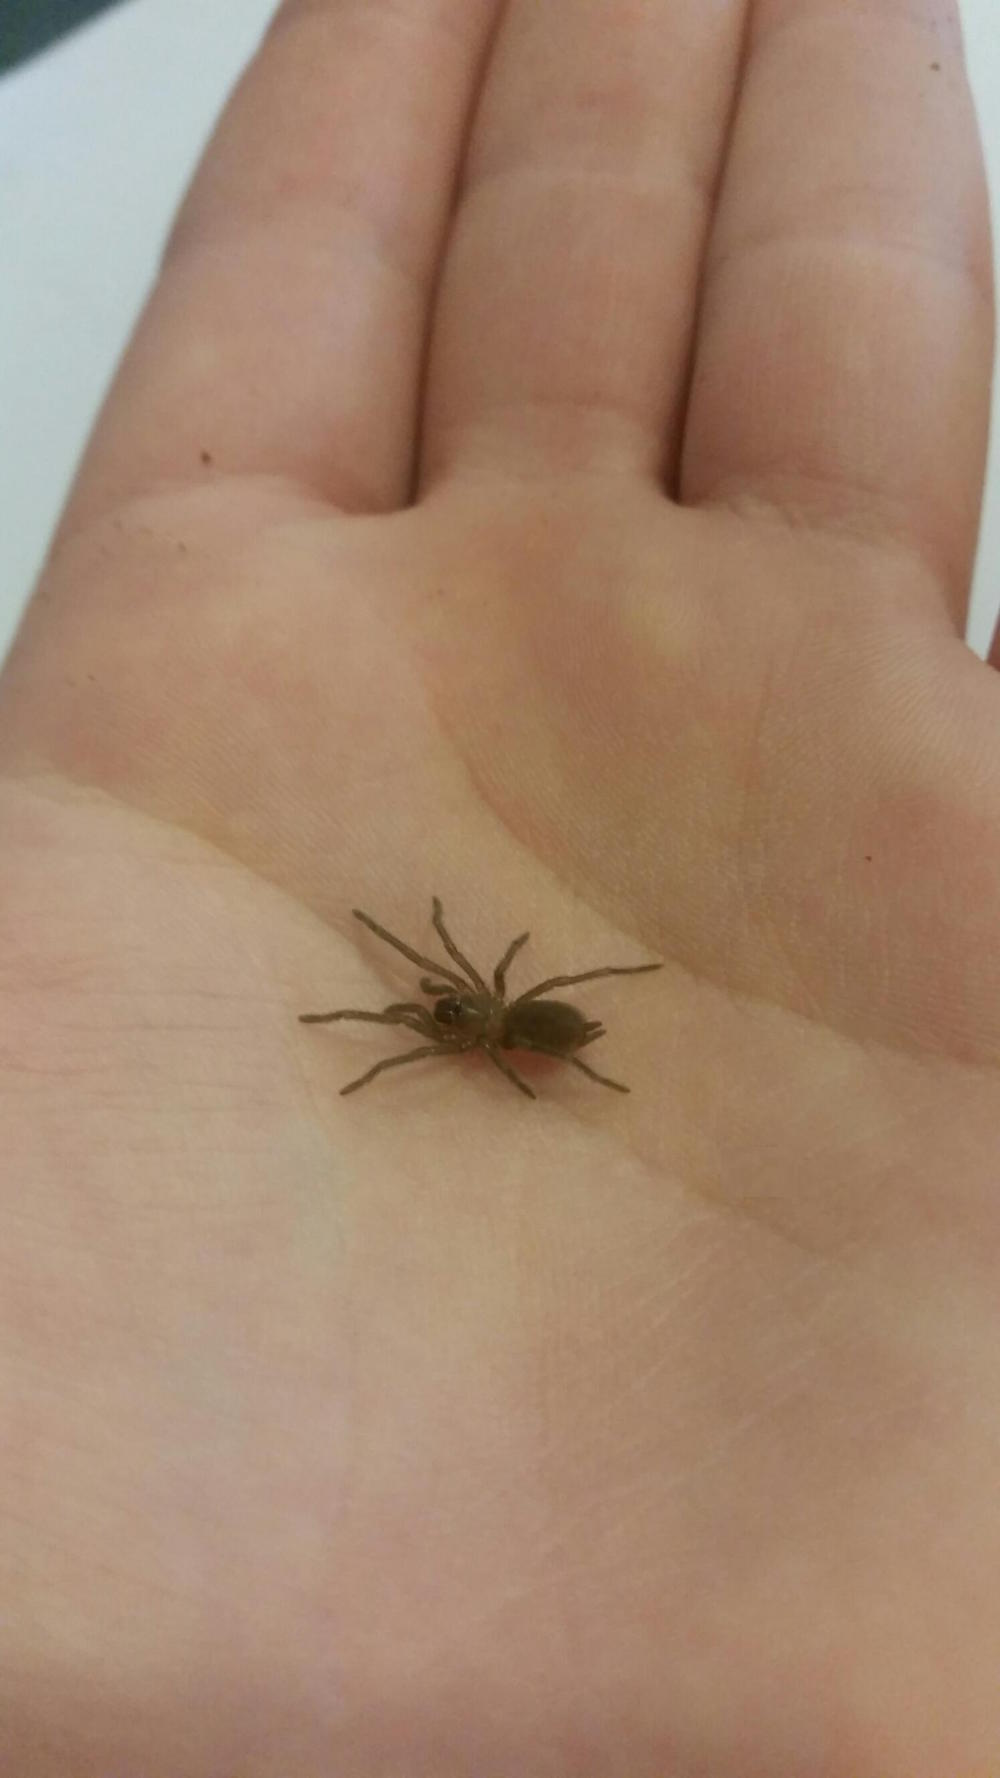 Baby tarantula on hand, 3 months old. Photo: Ziggy Nielsen, Animal Ark